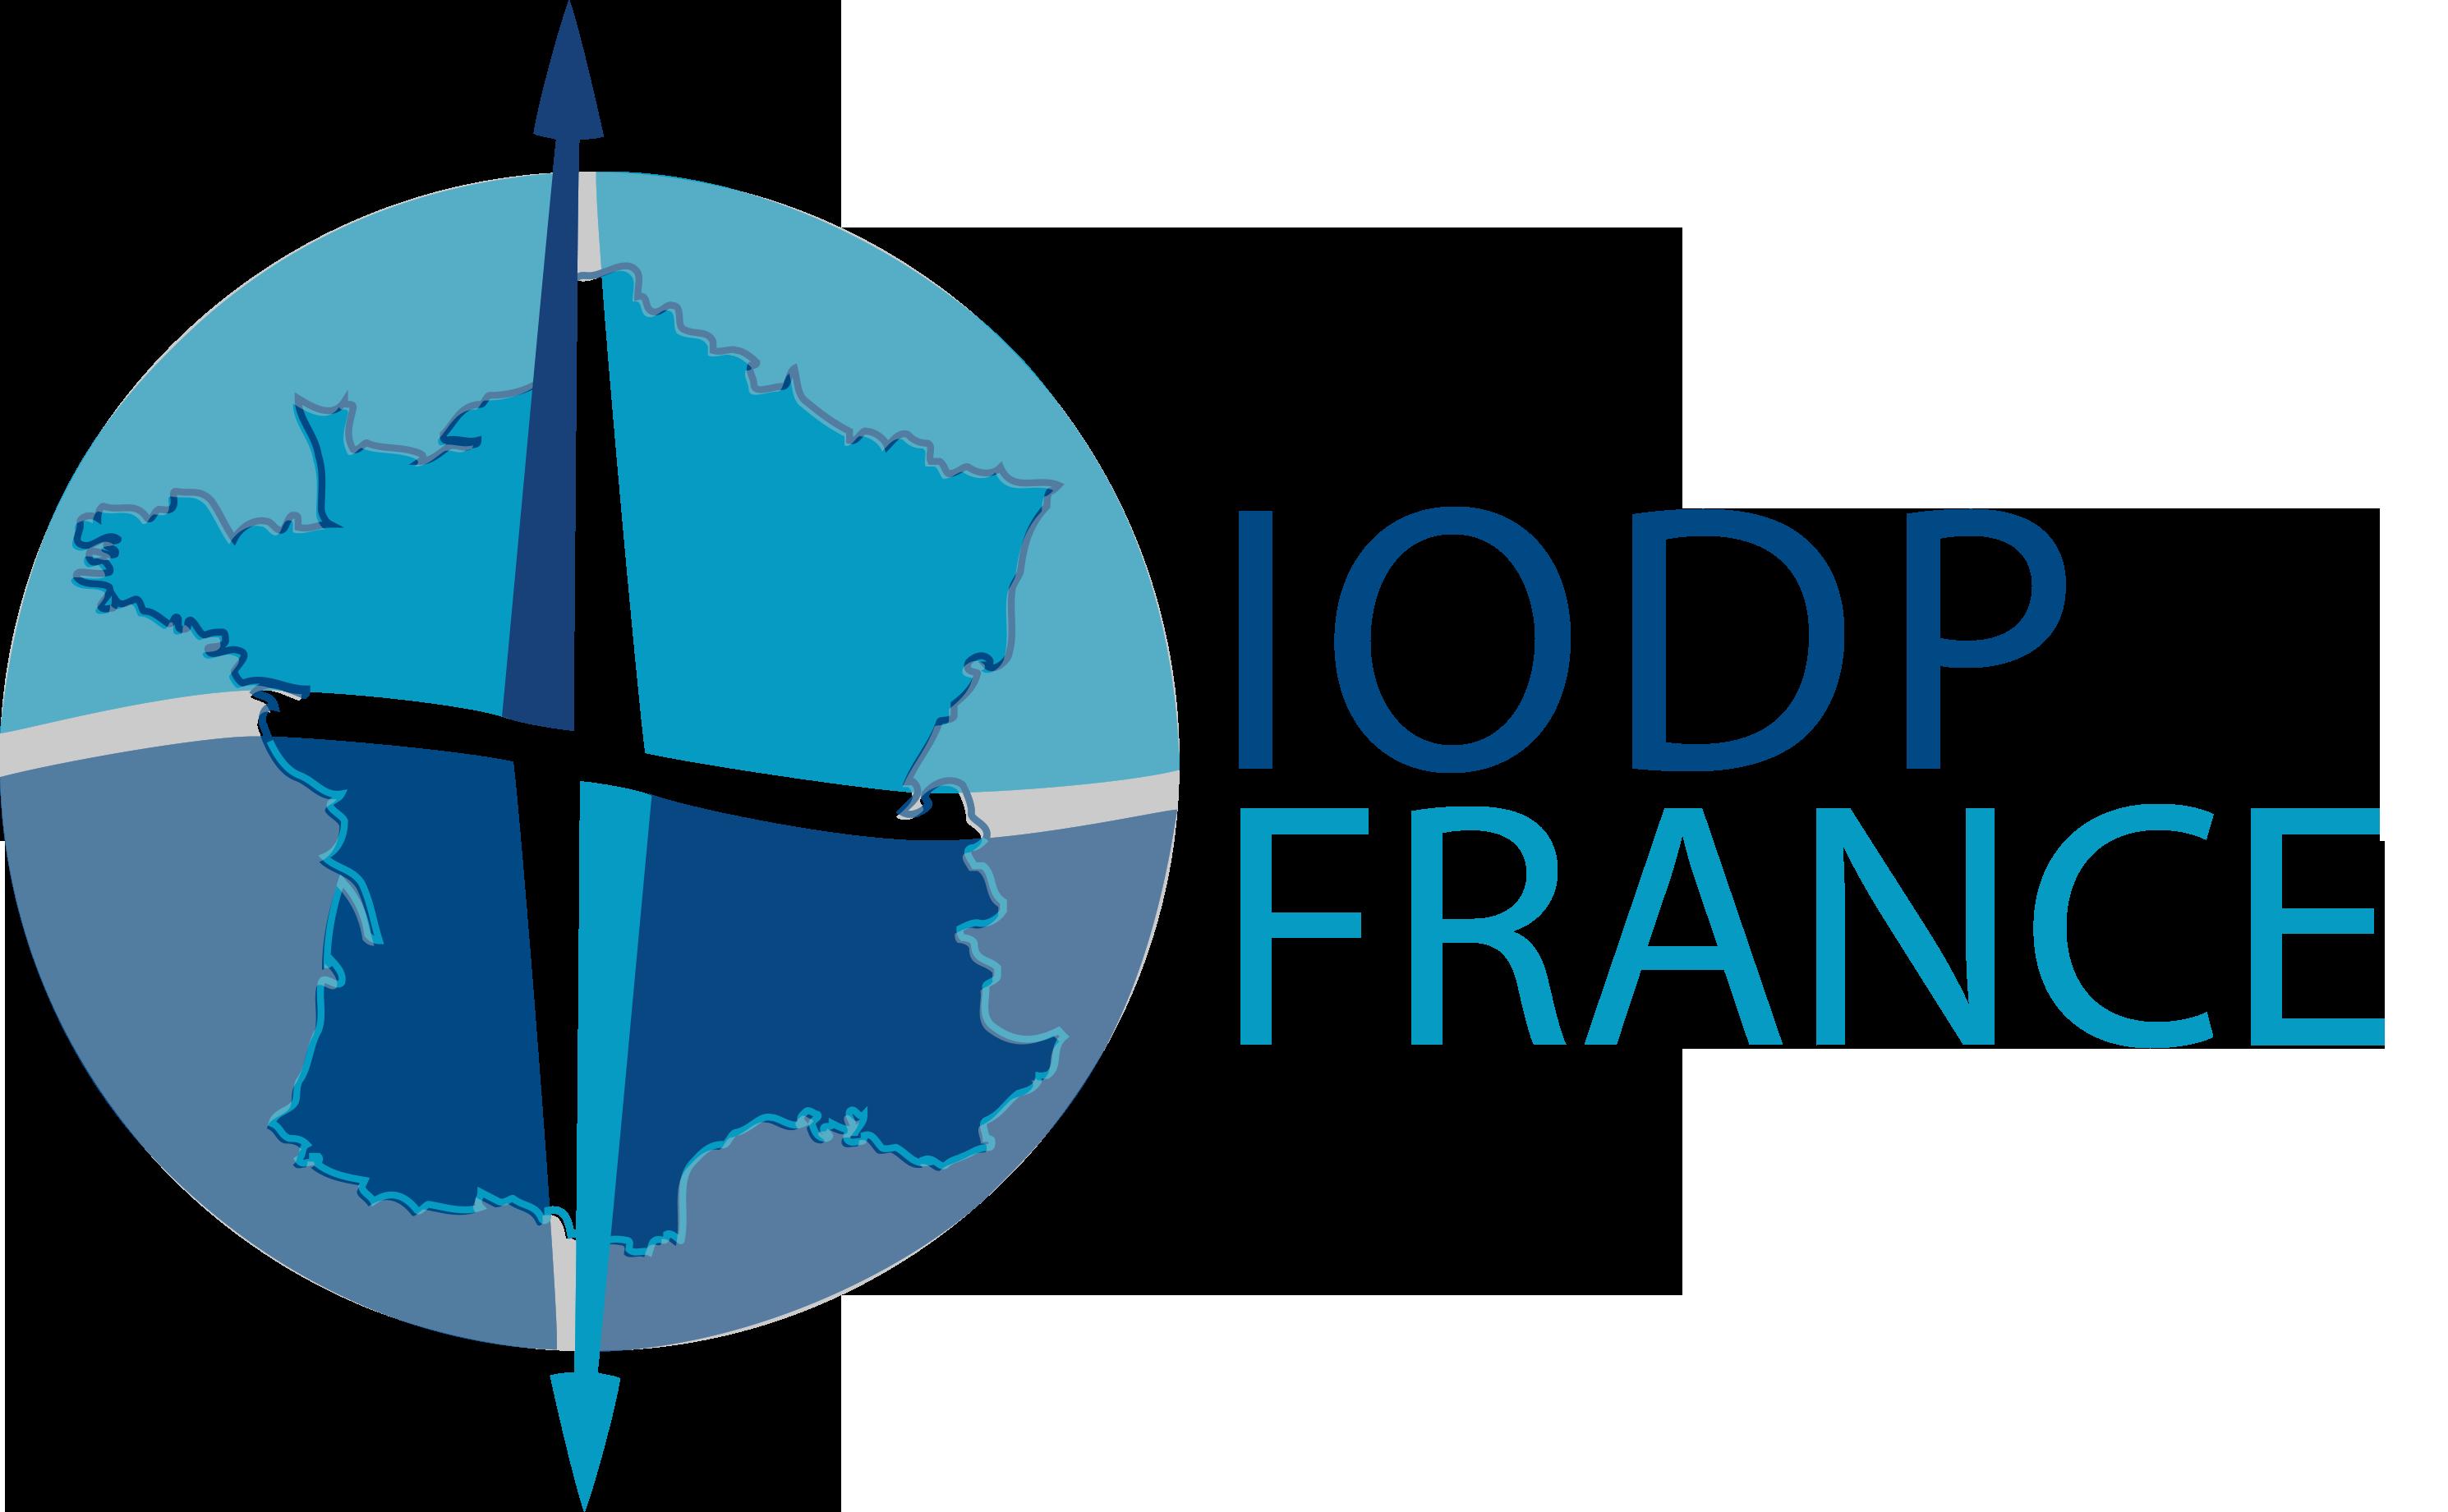 IODP France